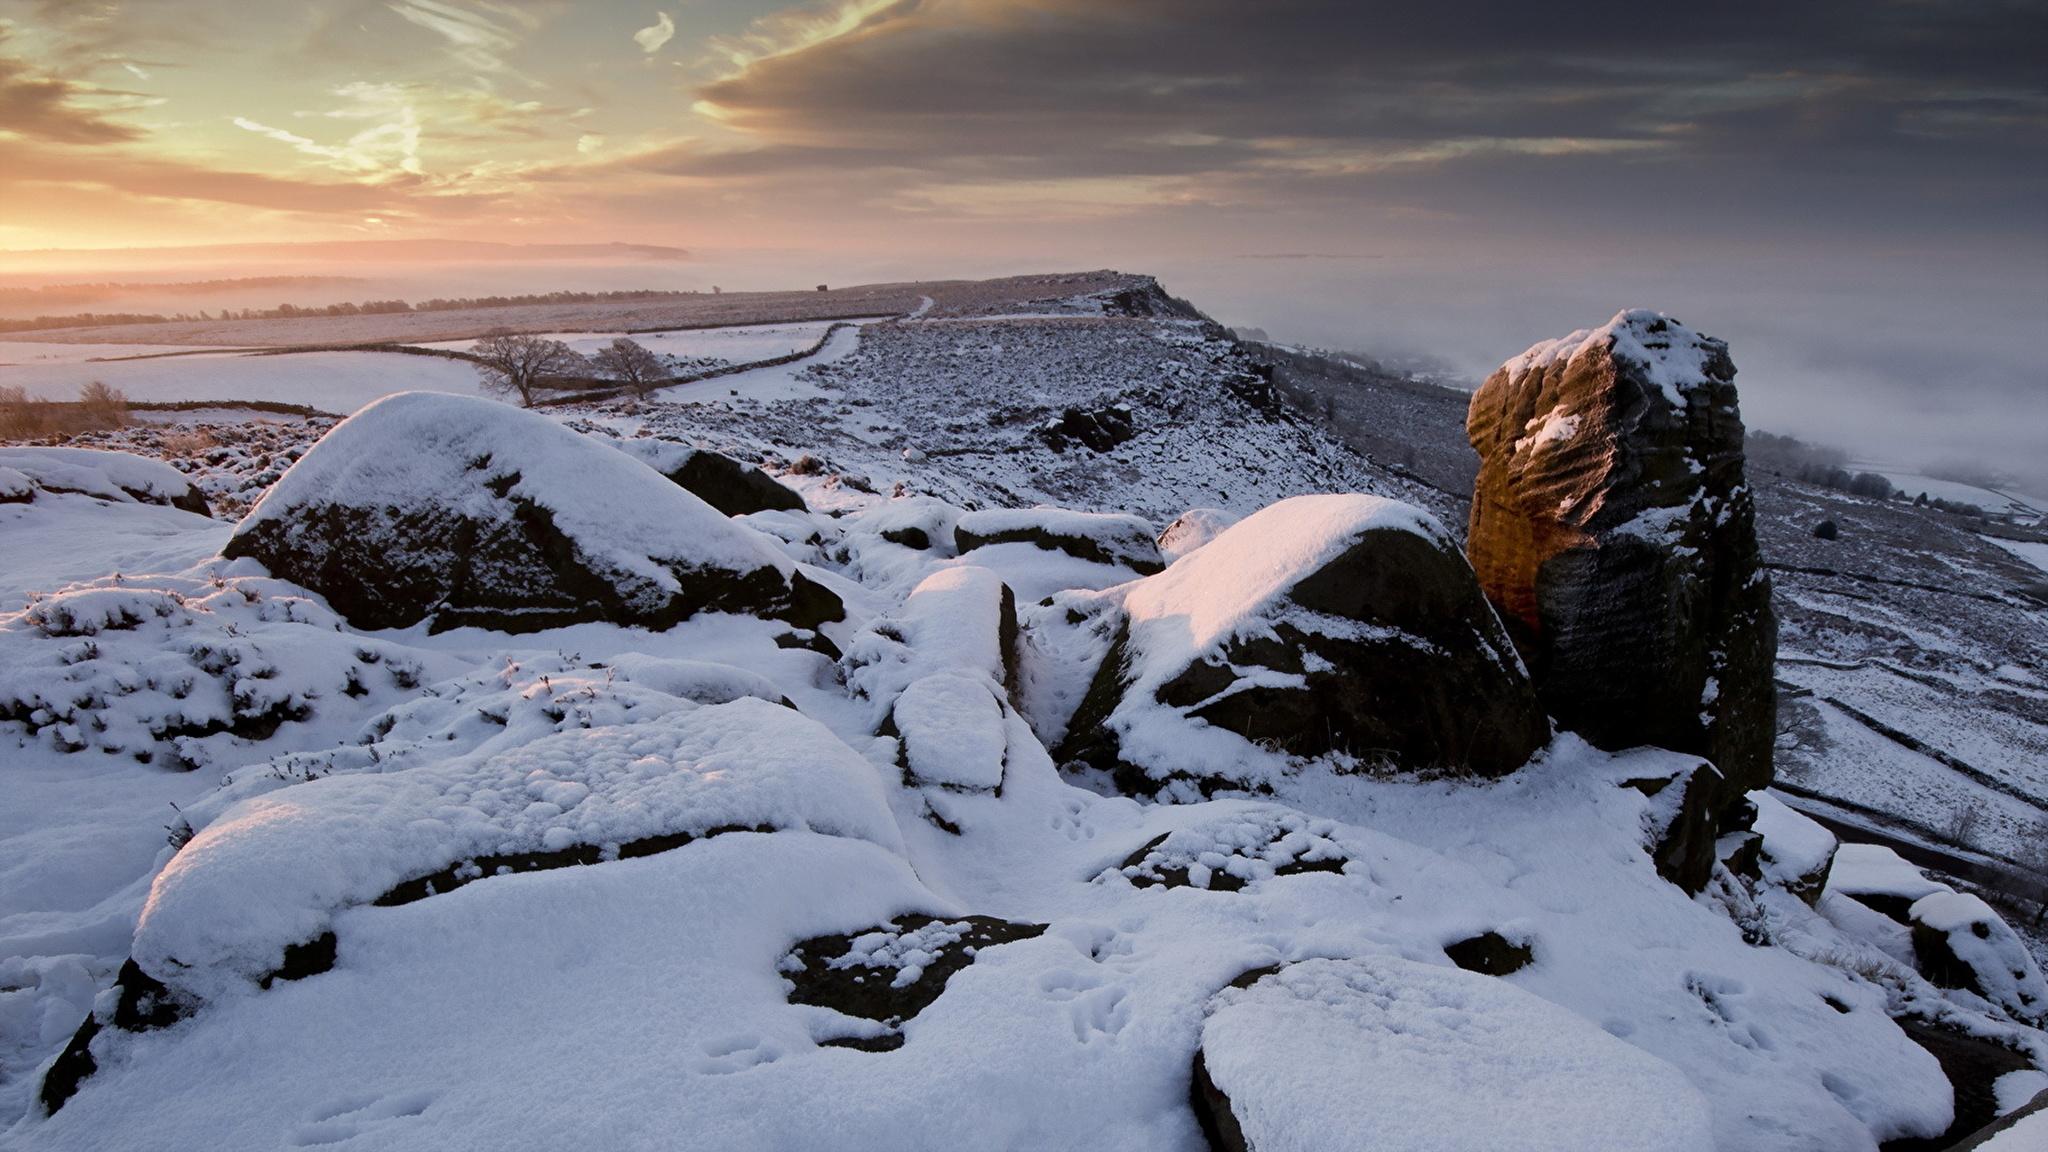 снег камни гора snow stones mountain скачать